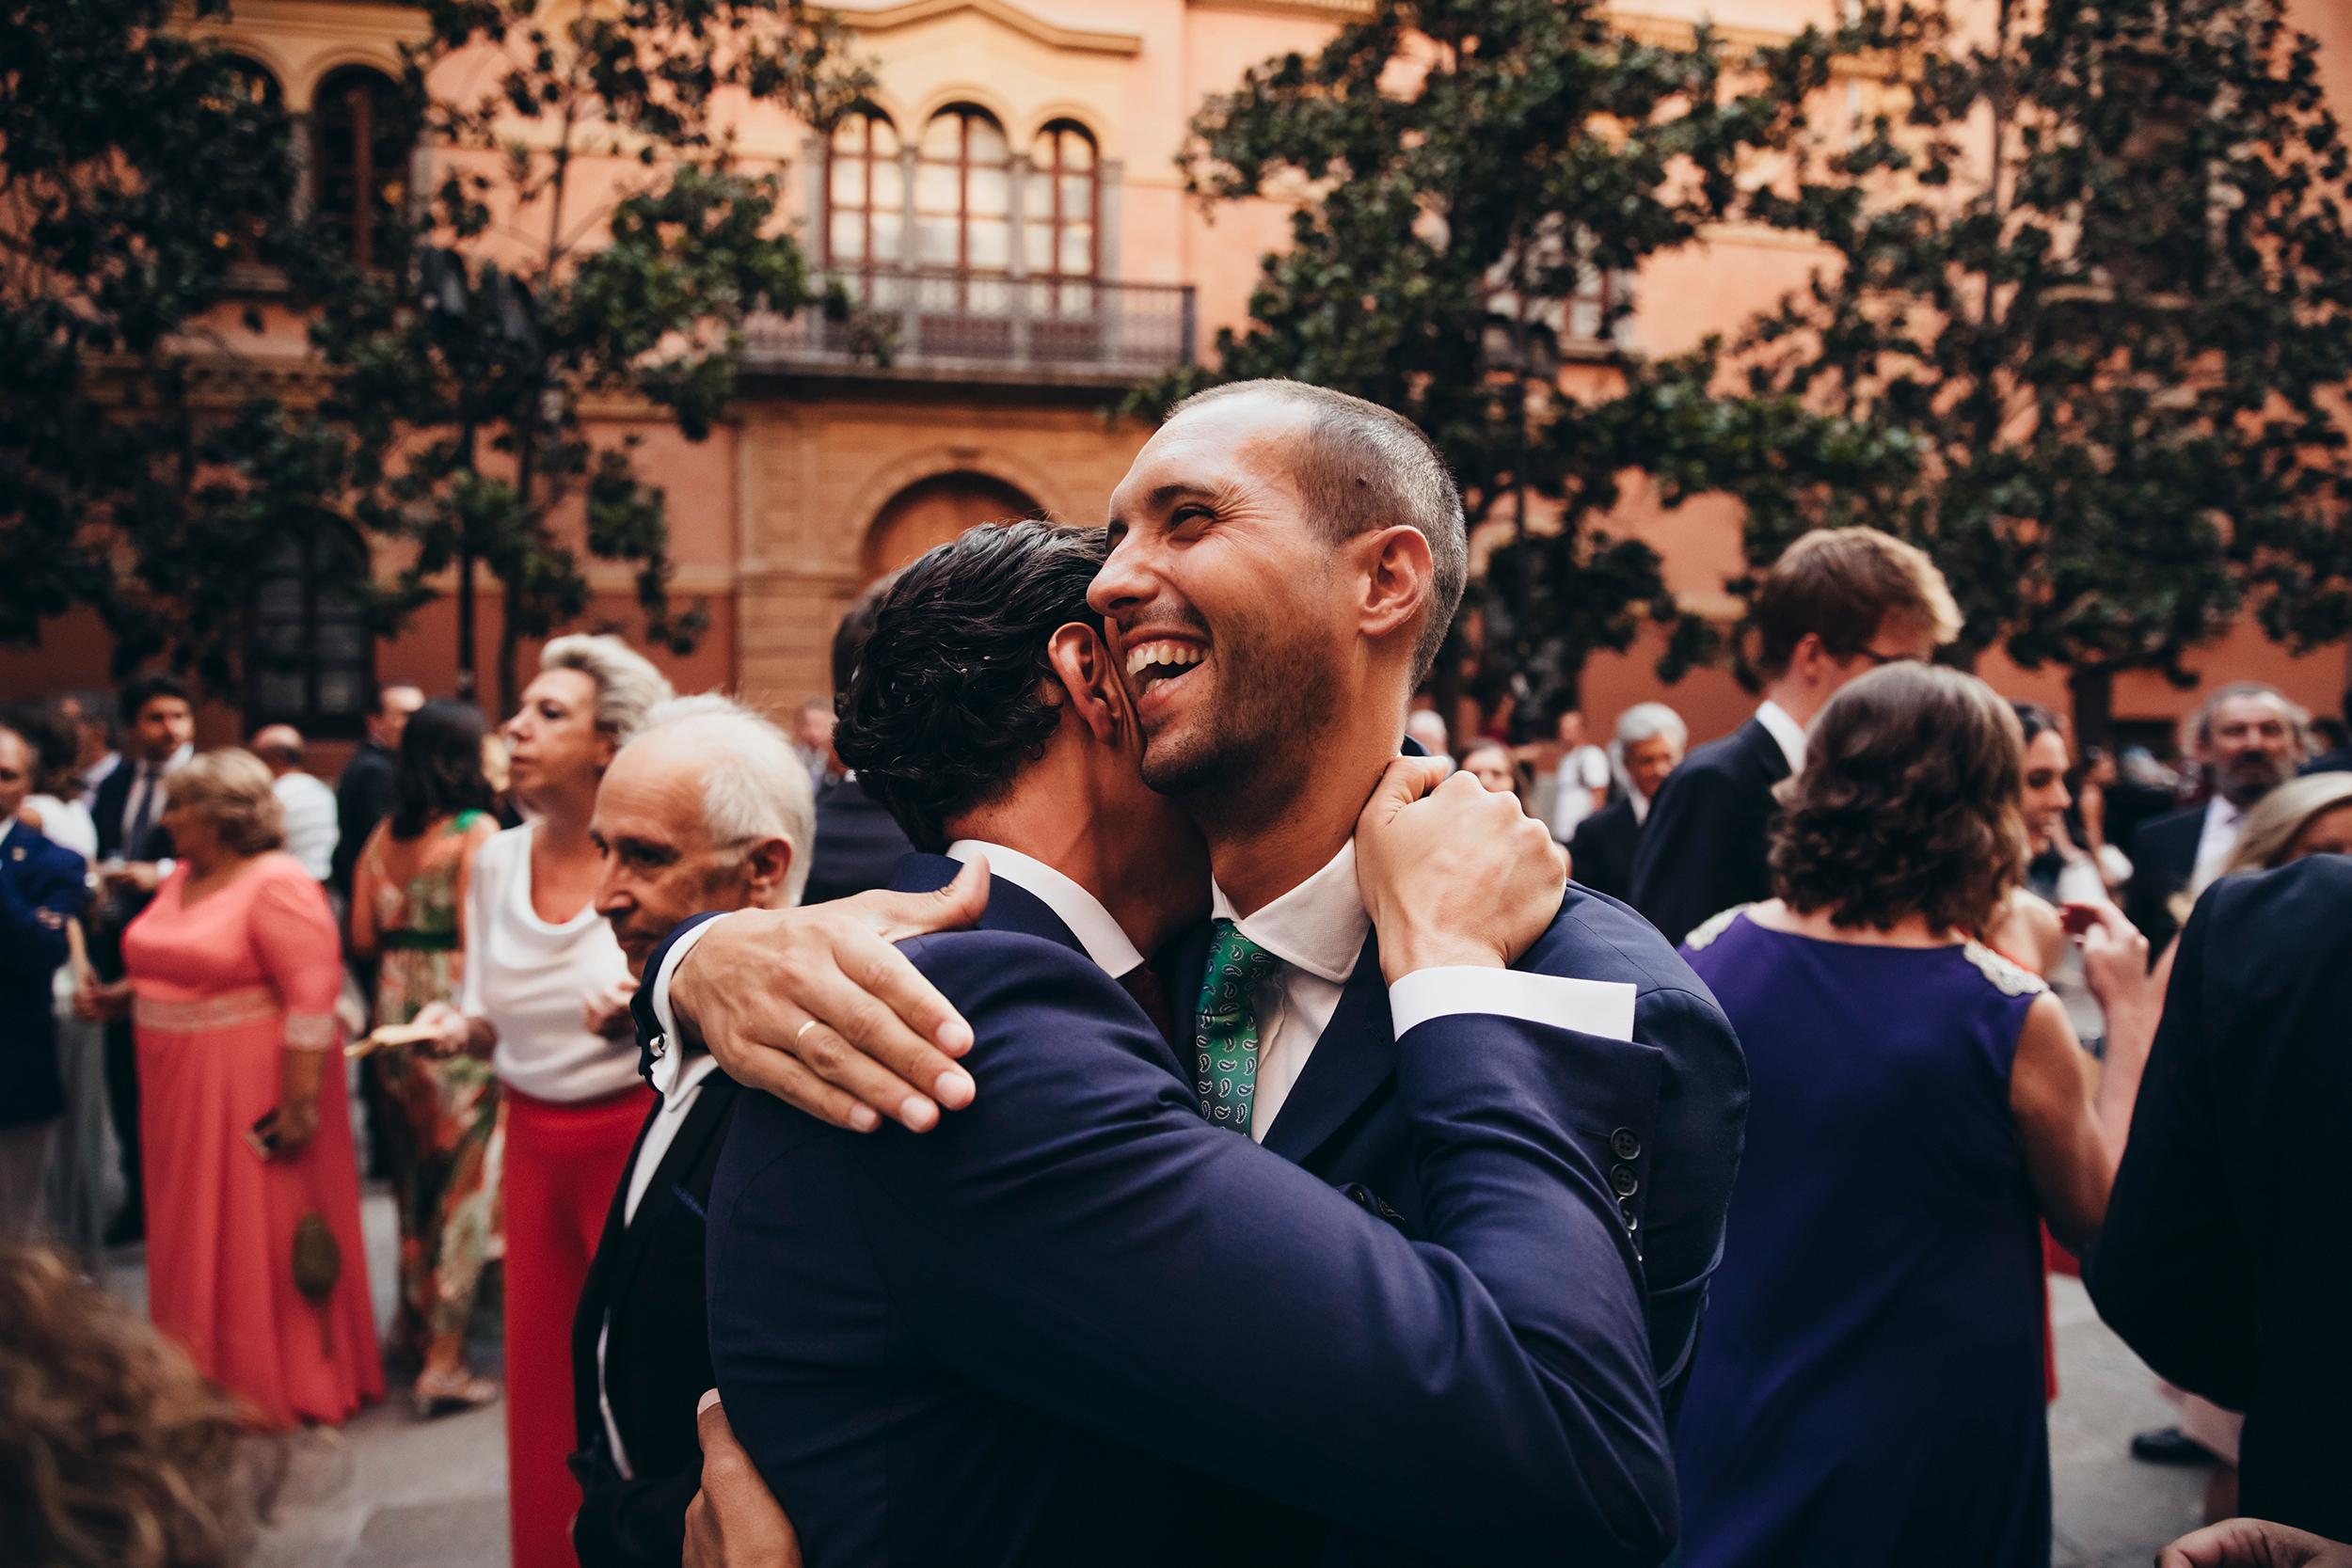 fotografo-bodas-granada-catedral-sagrario-jose-reyes_054.jpg